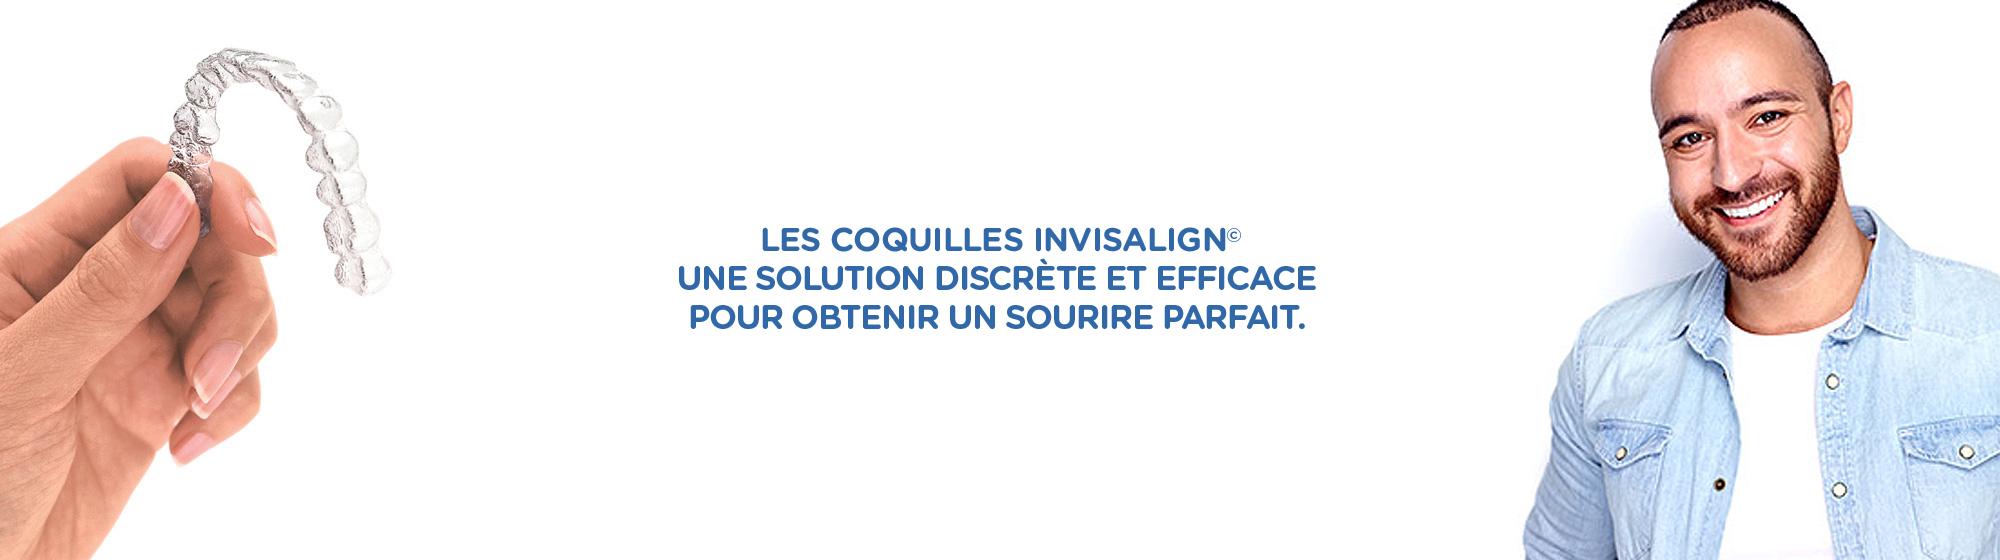 Coquilles Invisalign Prisma Dentistes Montreal